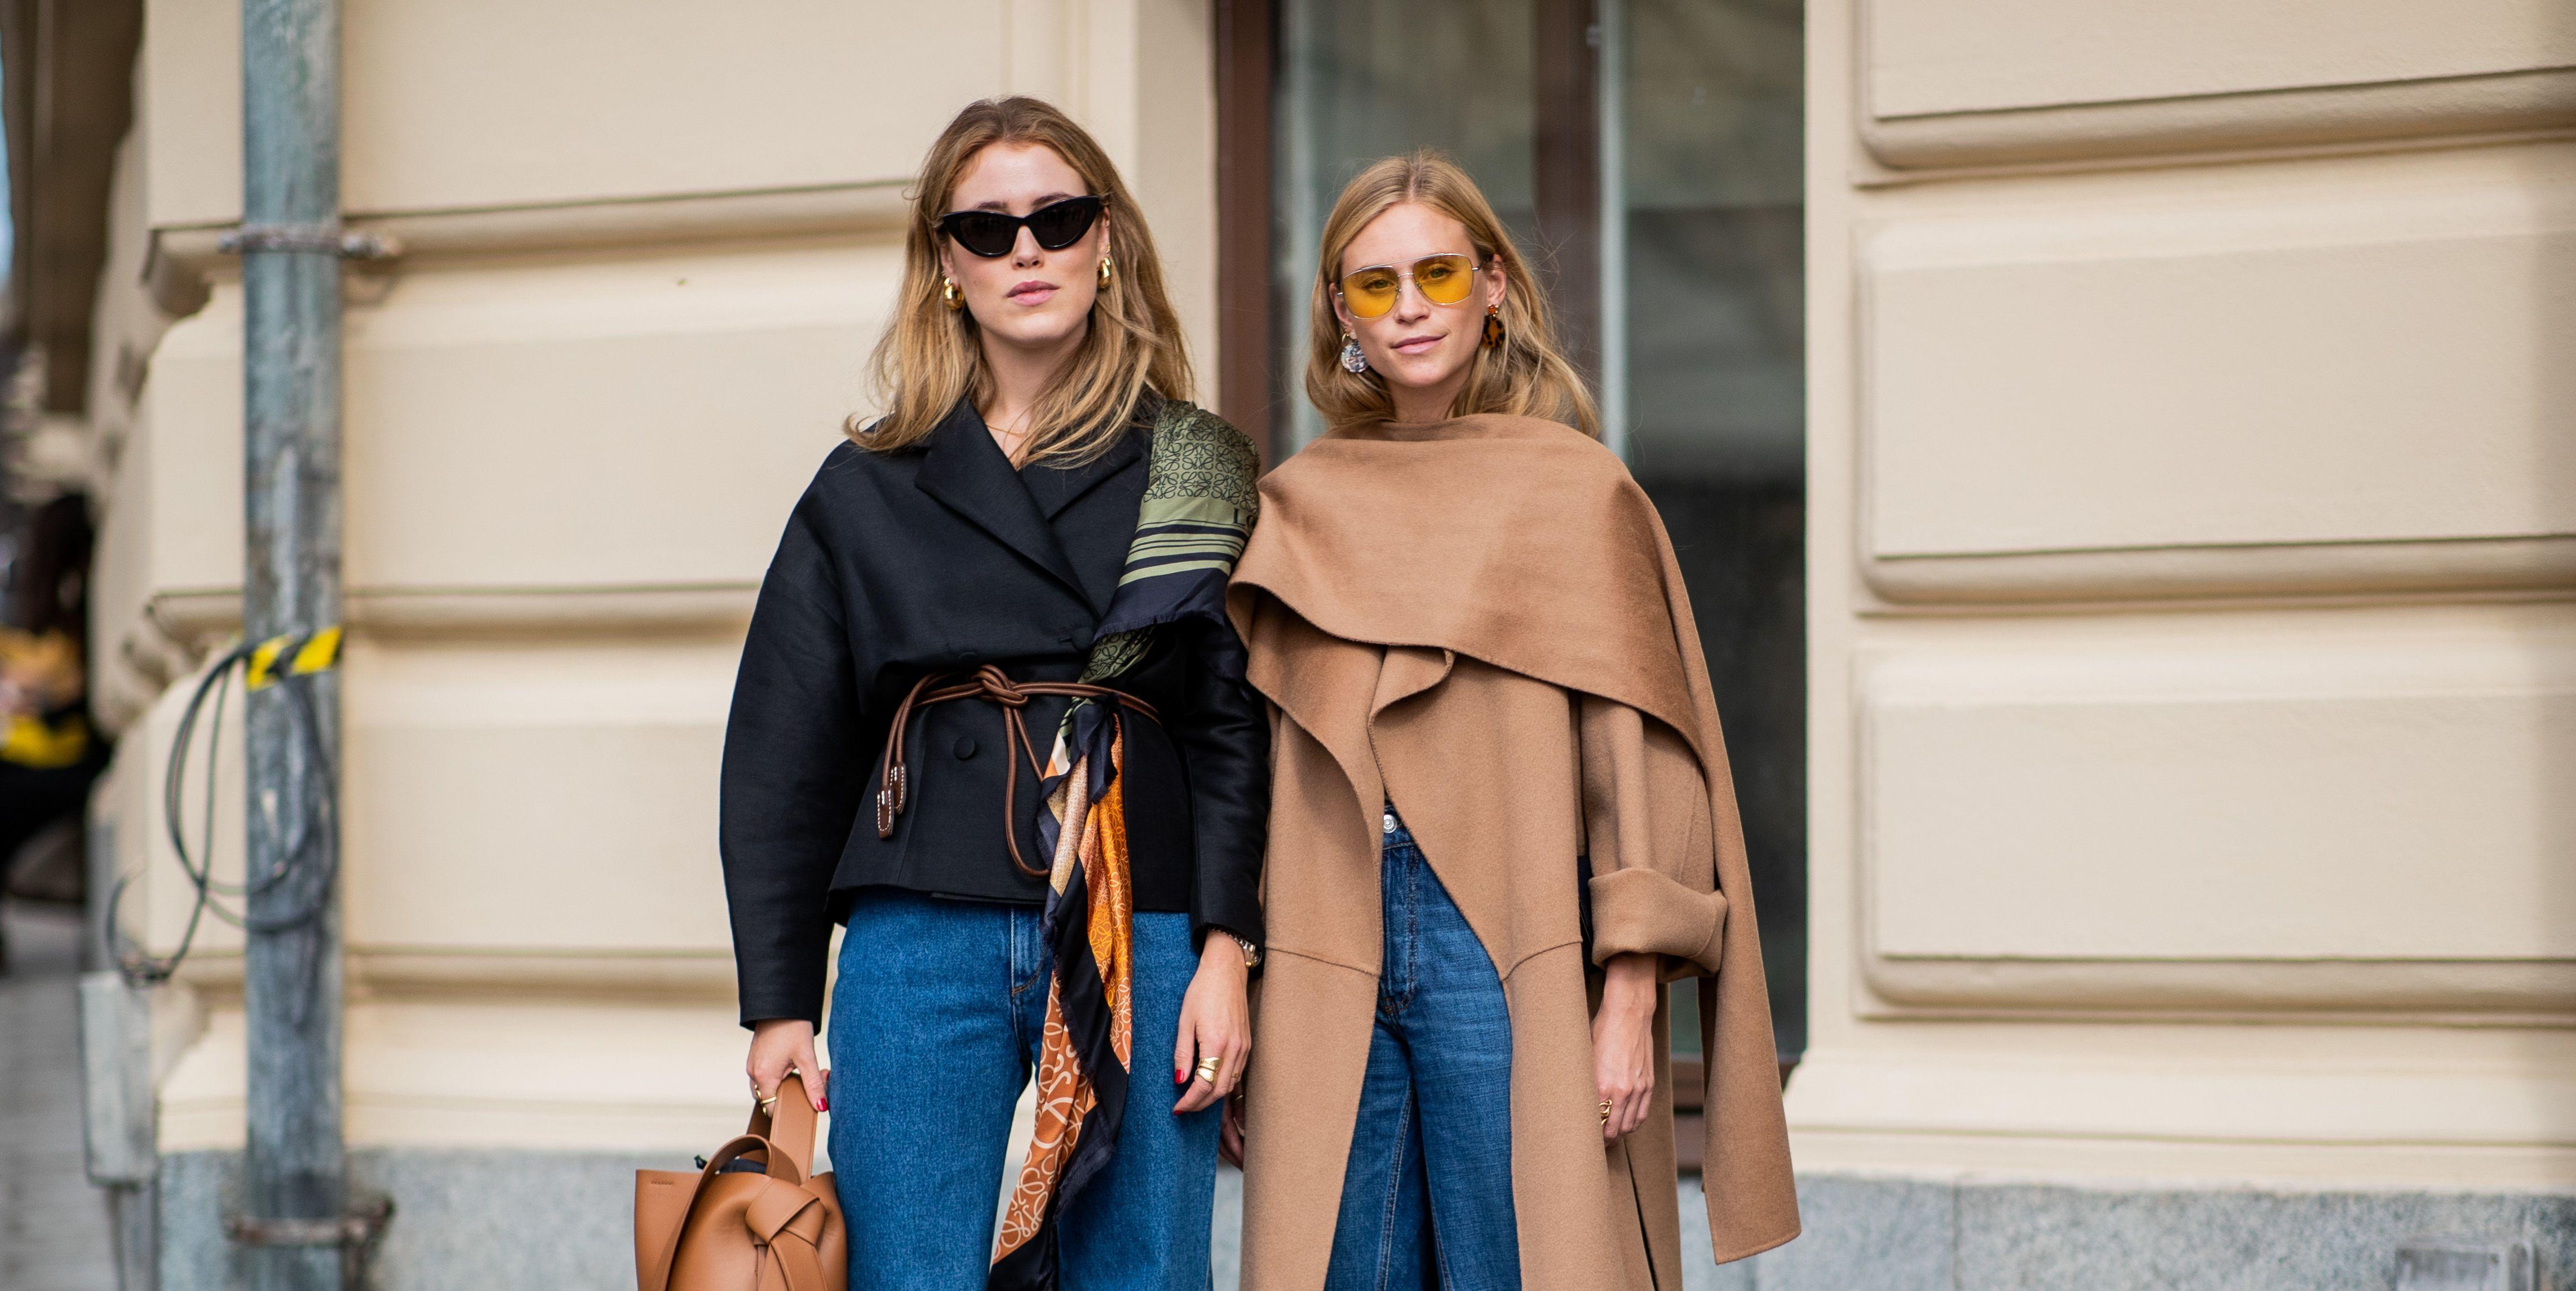 Jeans, trends jeans, jeans 2018, jeans winter 2018, jeans trends, jeans trends winter 2018